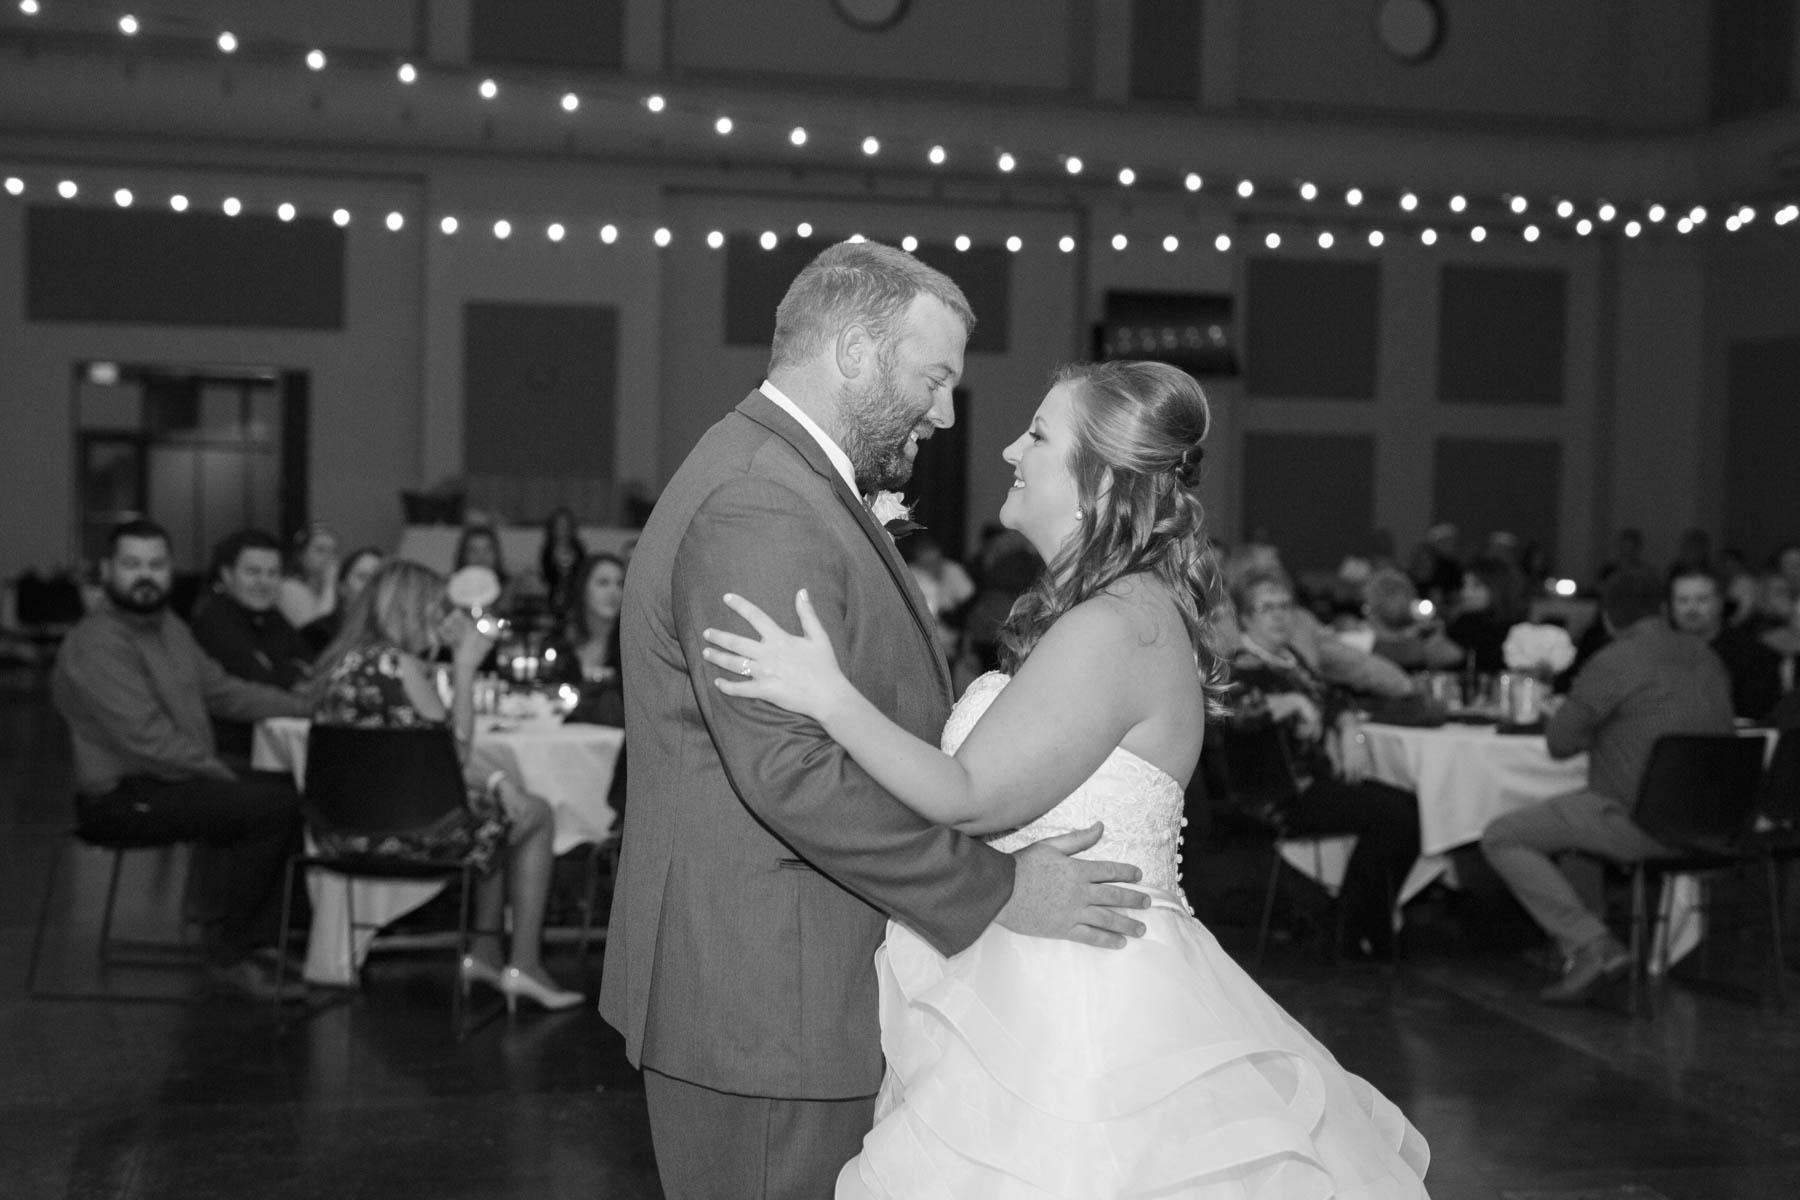 shotbychelsea_blog_wedding-32.jpg